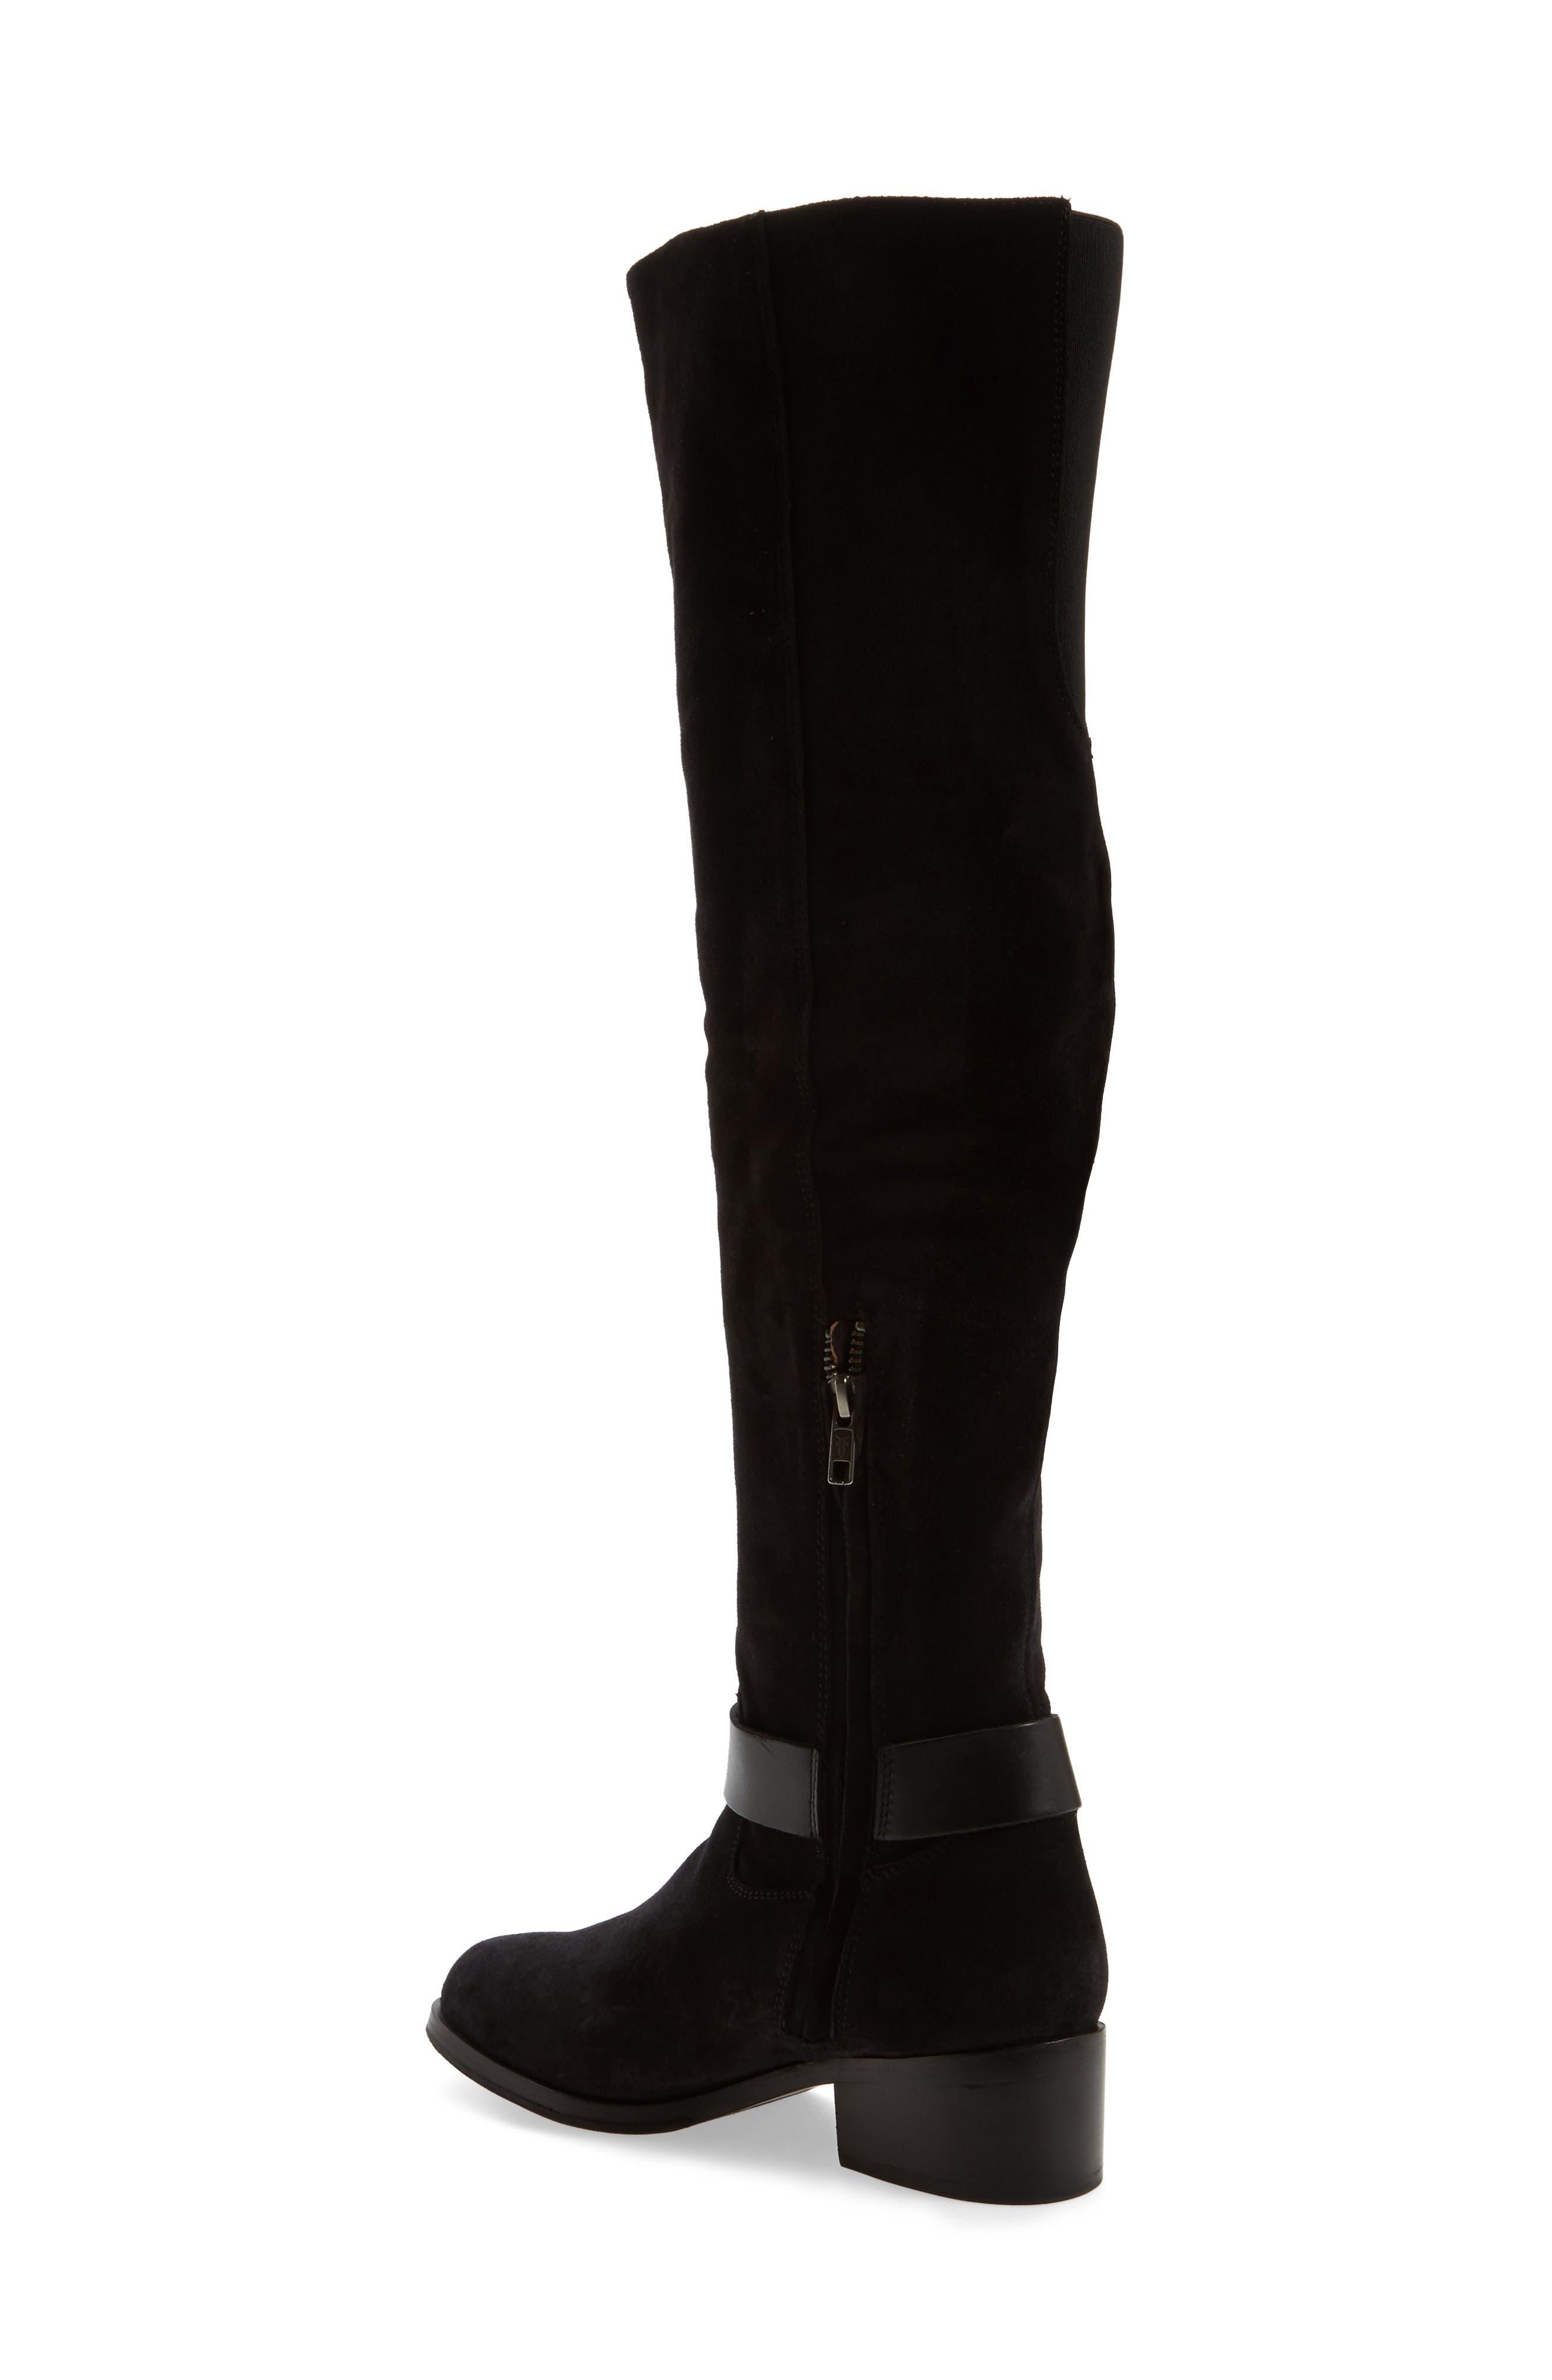 Kristen Harness Over the Knee Boot,                             Alternate thumbnail 2, color,                             001